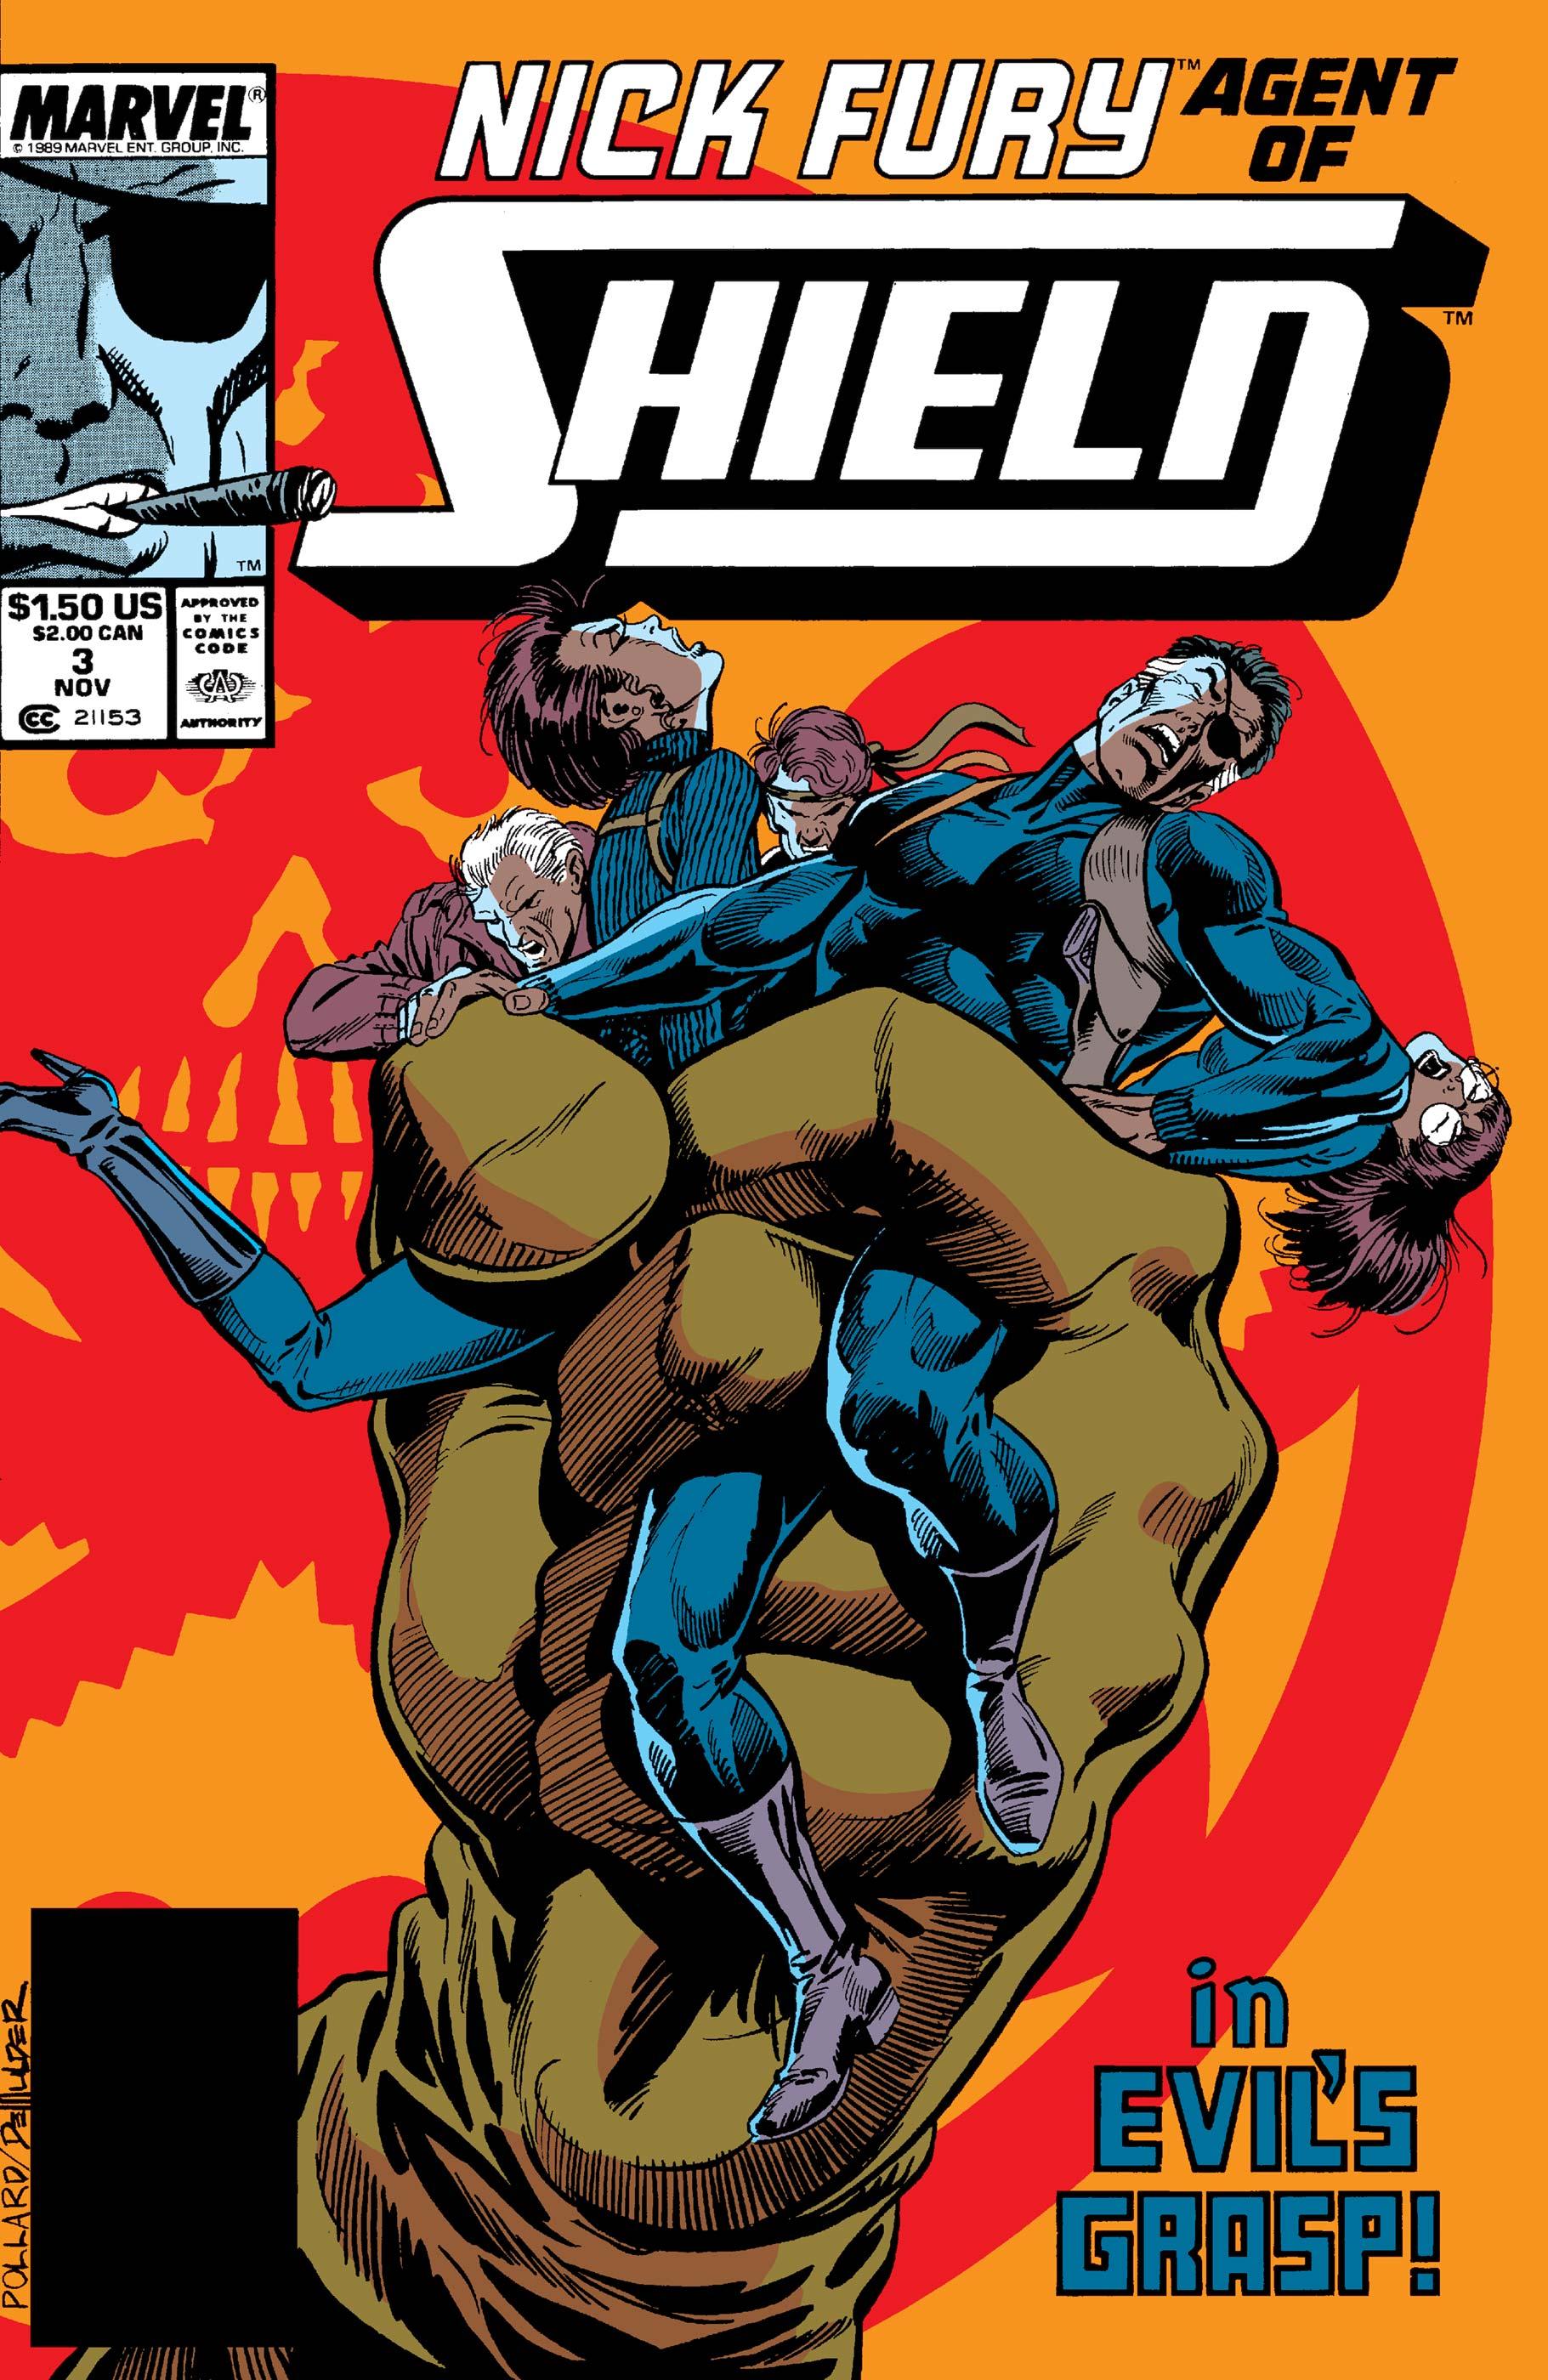 Nick Fury, Agent of S.H.I.E.L.D. (1989) #3